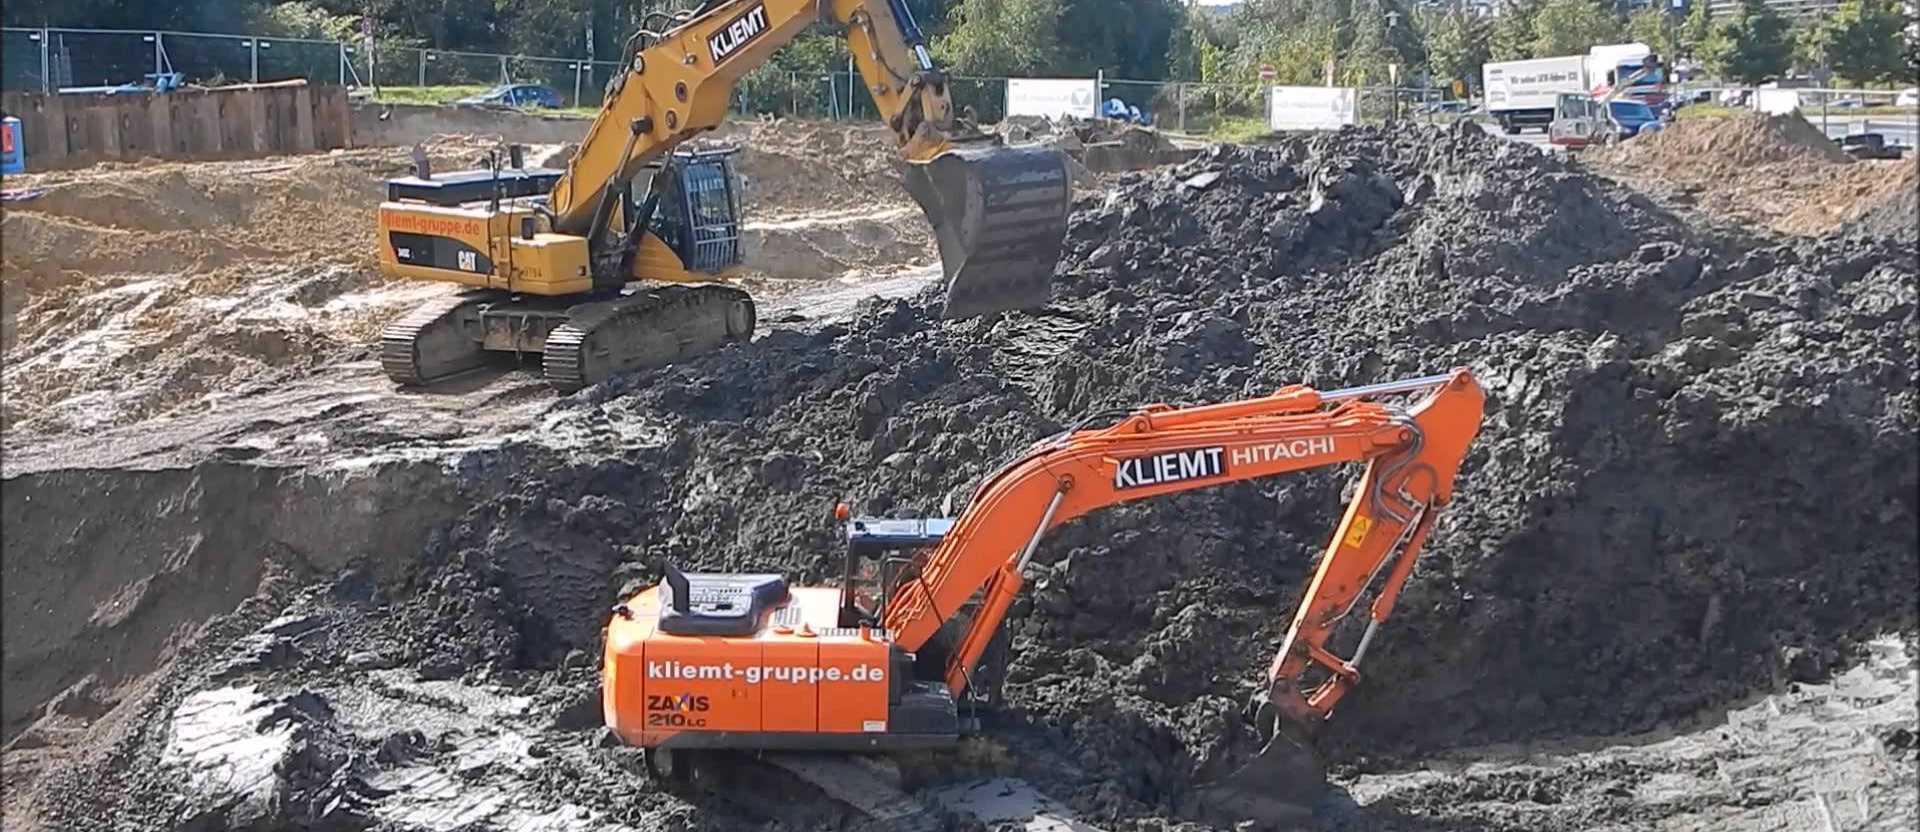 big shovel for Ralph BIM commentary 16OCT17